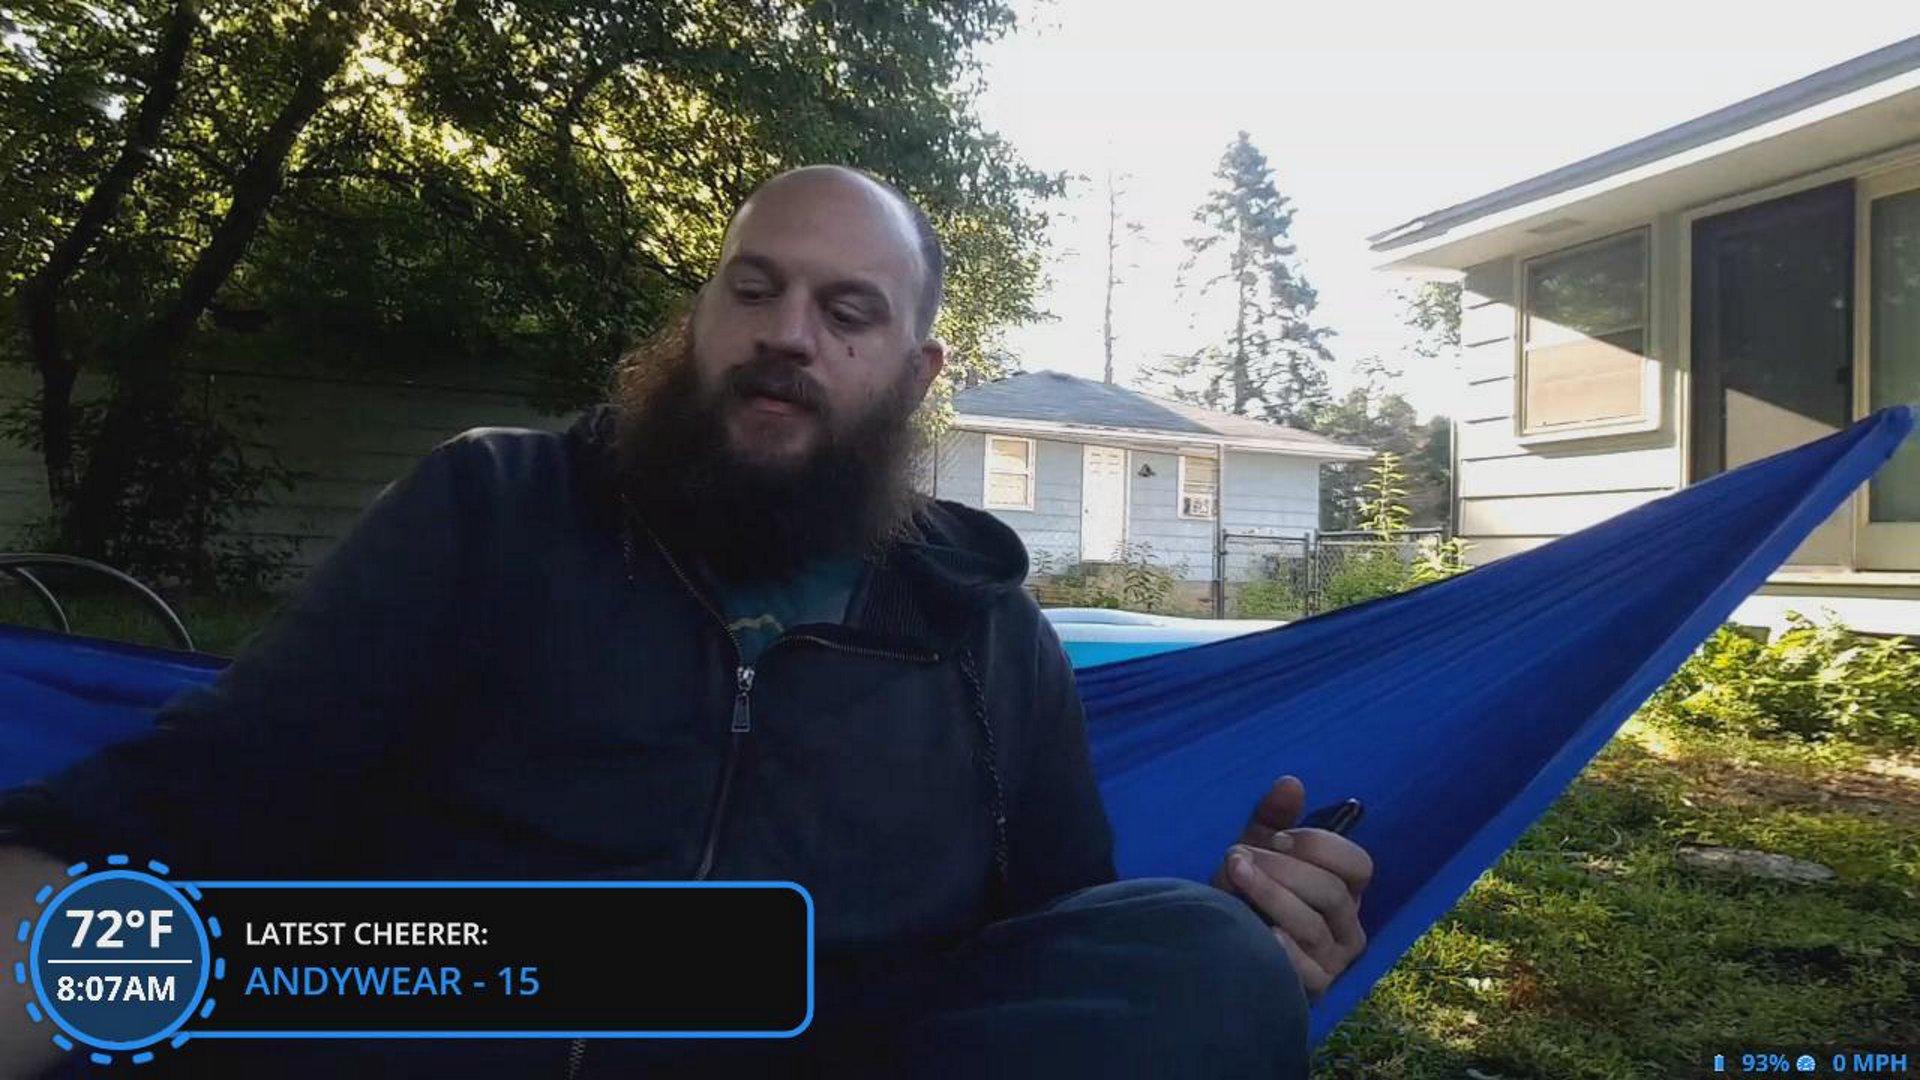 hammock-time-discord-bttv-sub-donate-luv-travel-outdoors-0600-https-t-co-8v1rhzeotq-https-t-co-o6djxgwvxf